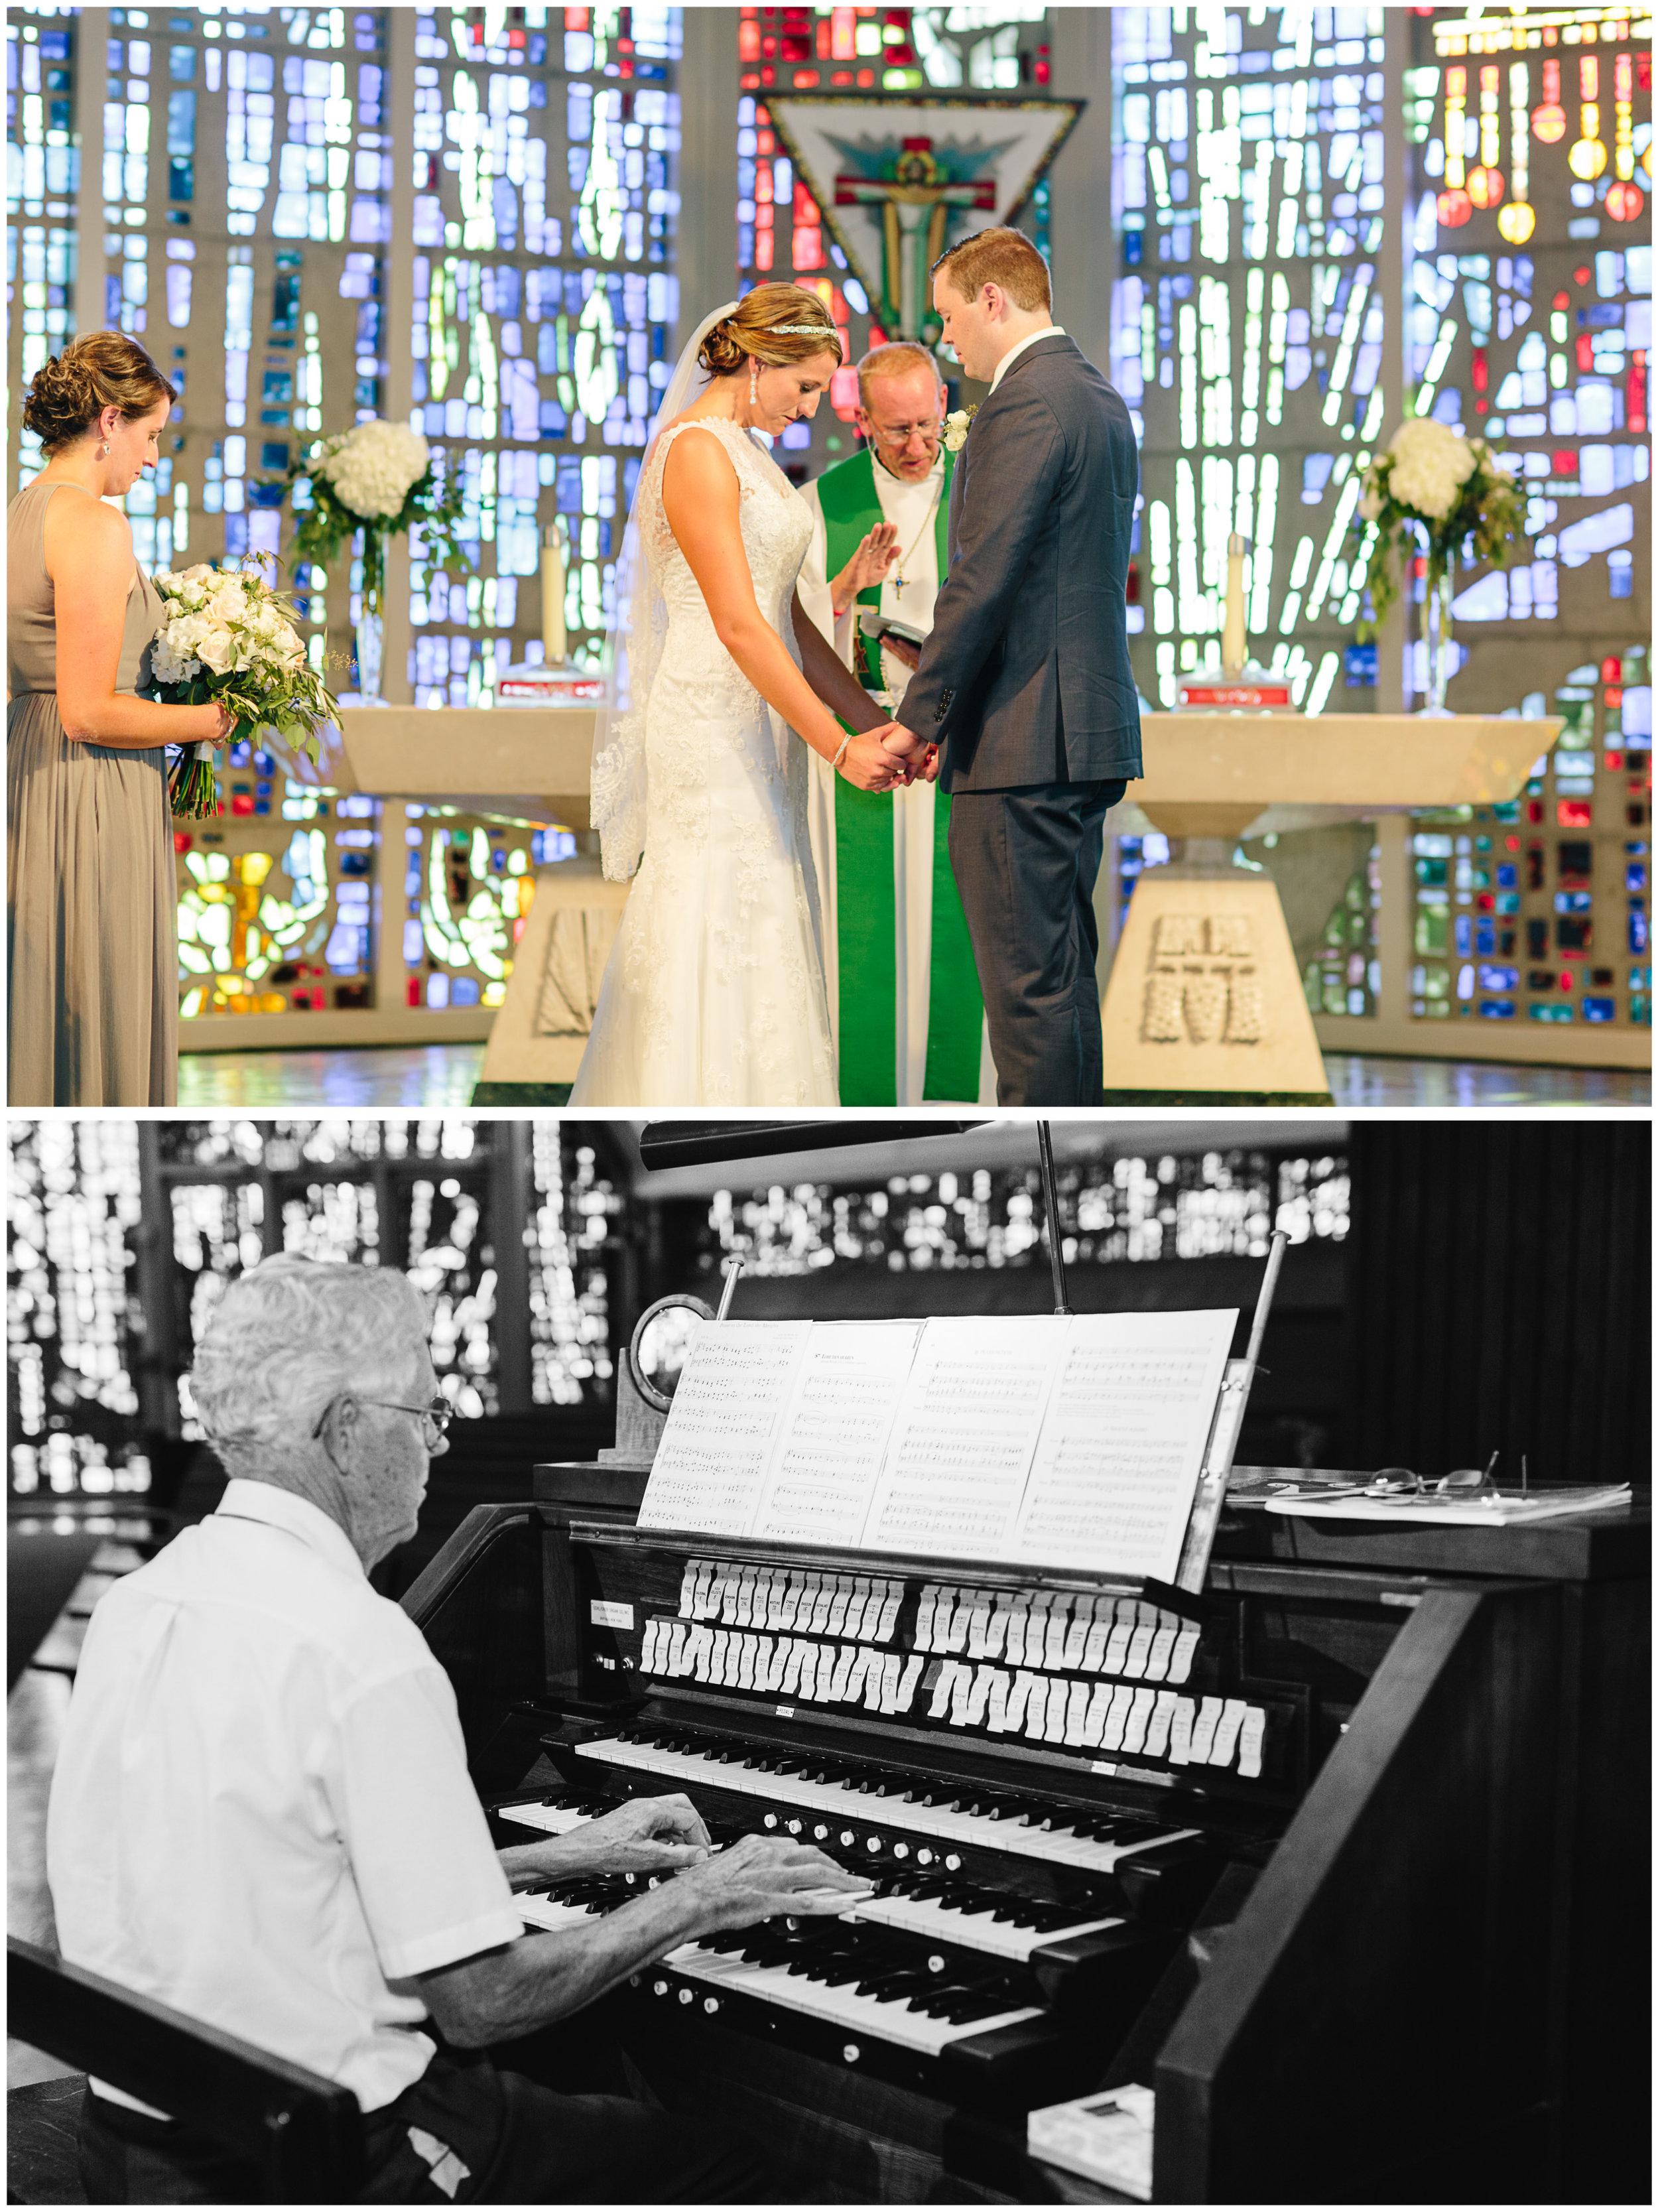 ann_arbor_michigan_wedding_65.jpg